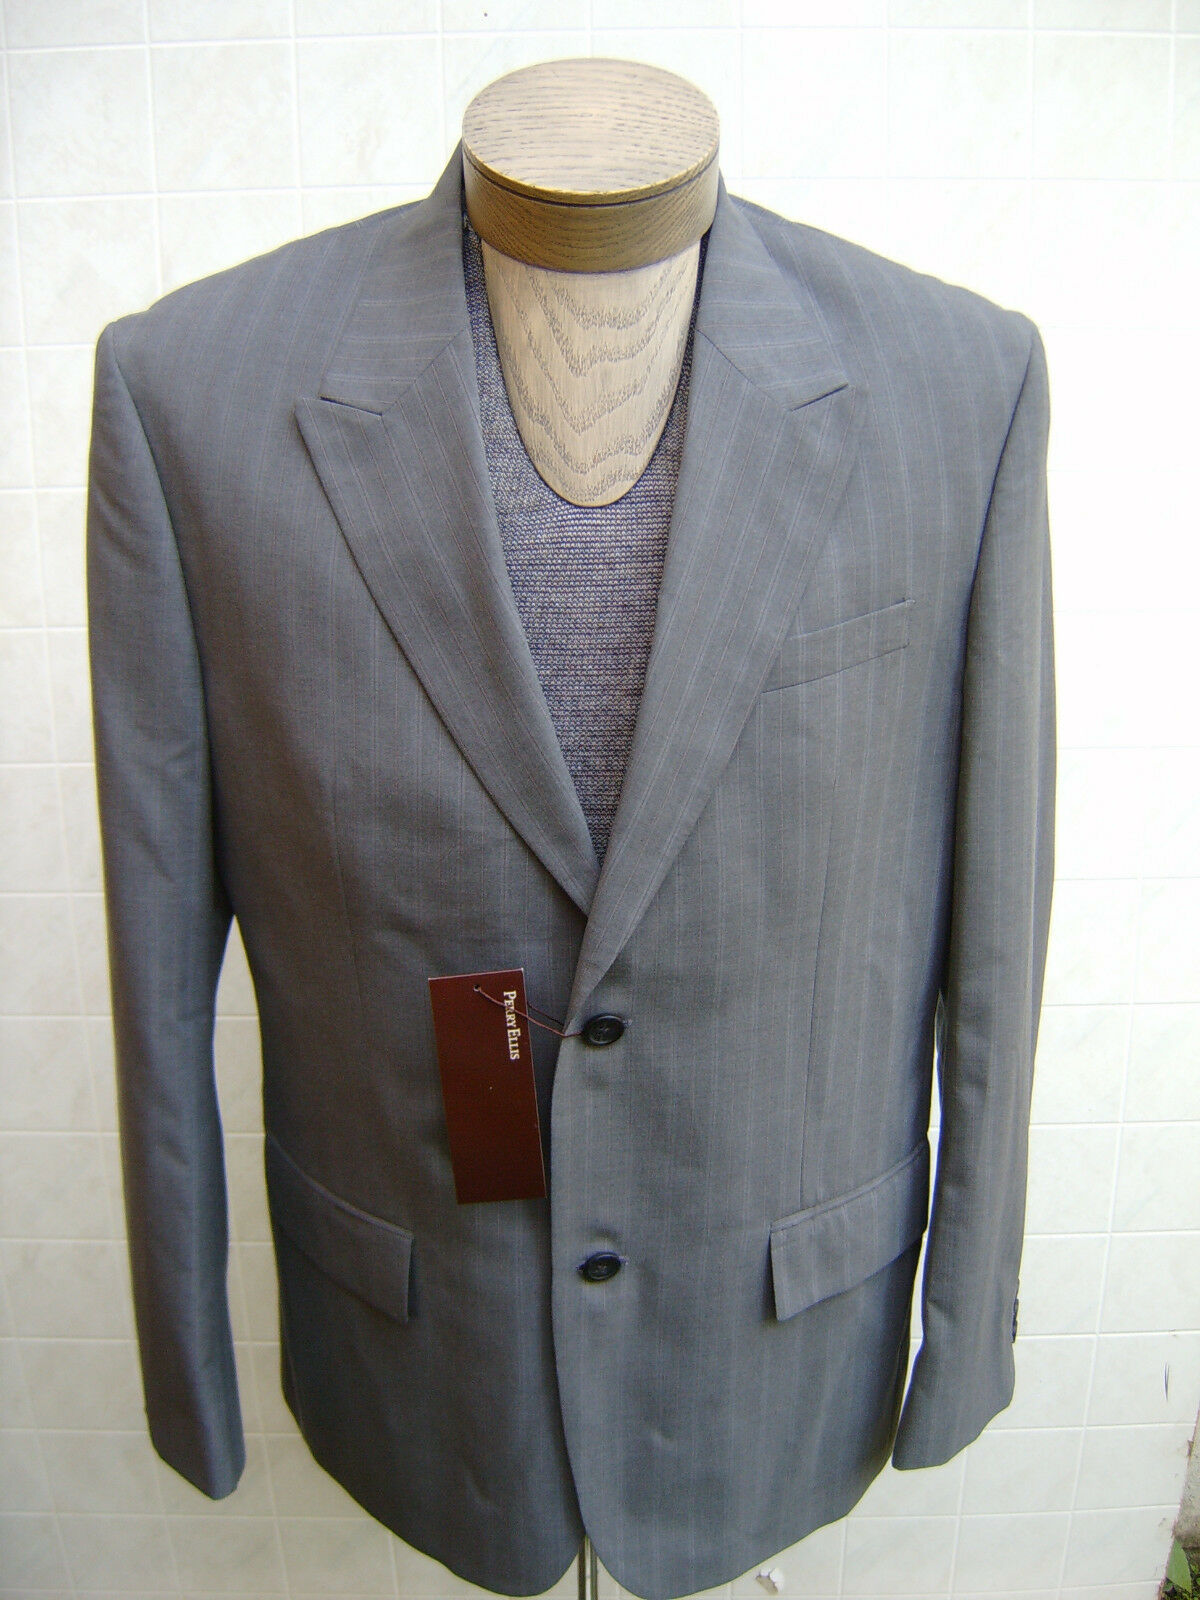 Perry Ellis  Herren Sport Coat Blazer Peak Lapel 2BTN Pinstripe grau Braun 44R 175